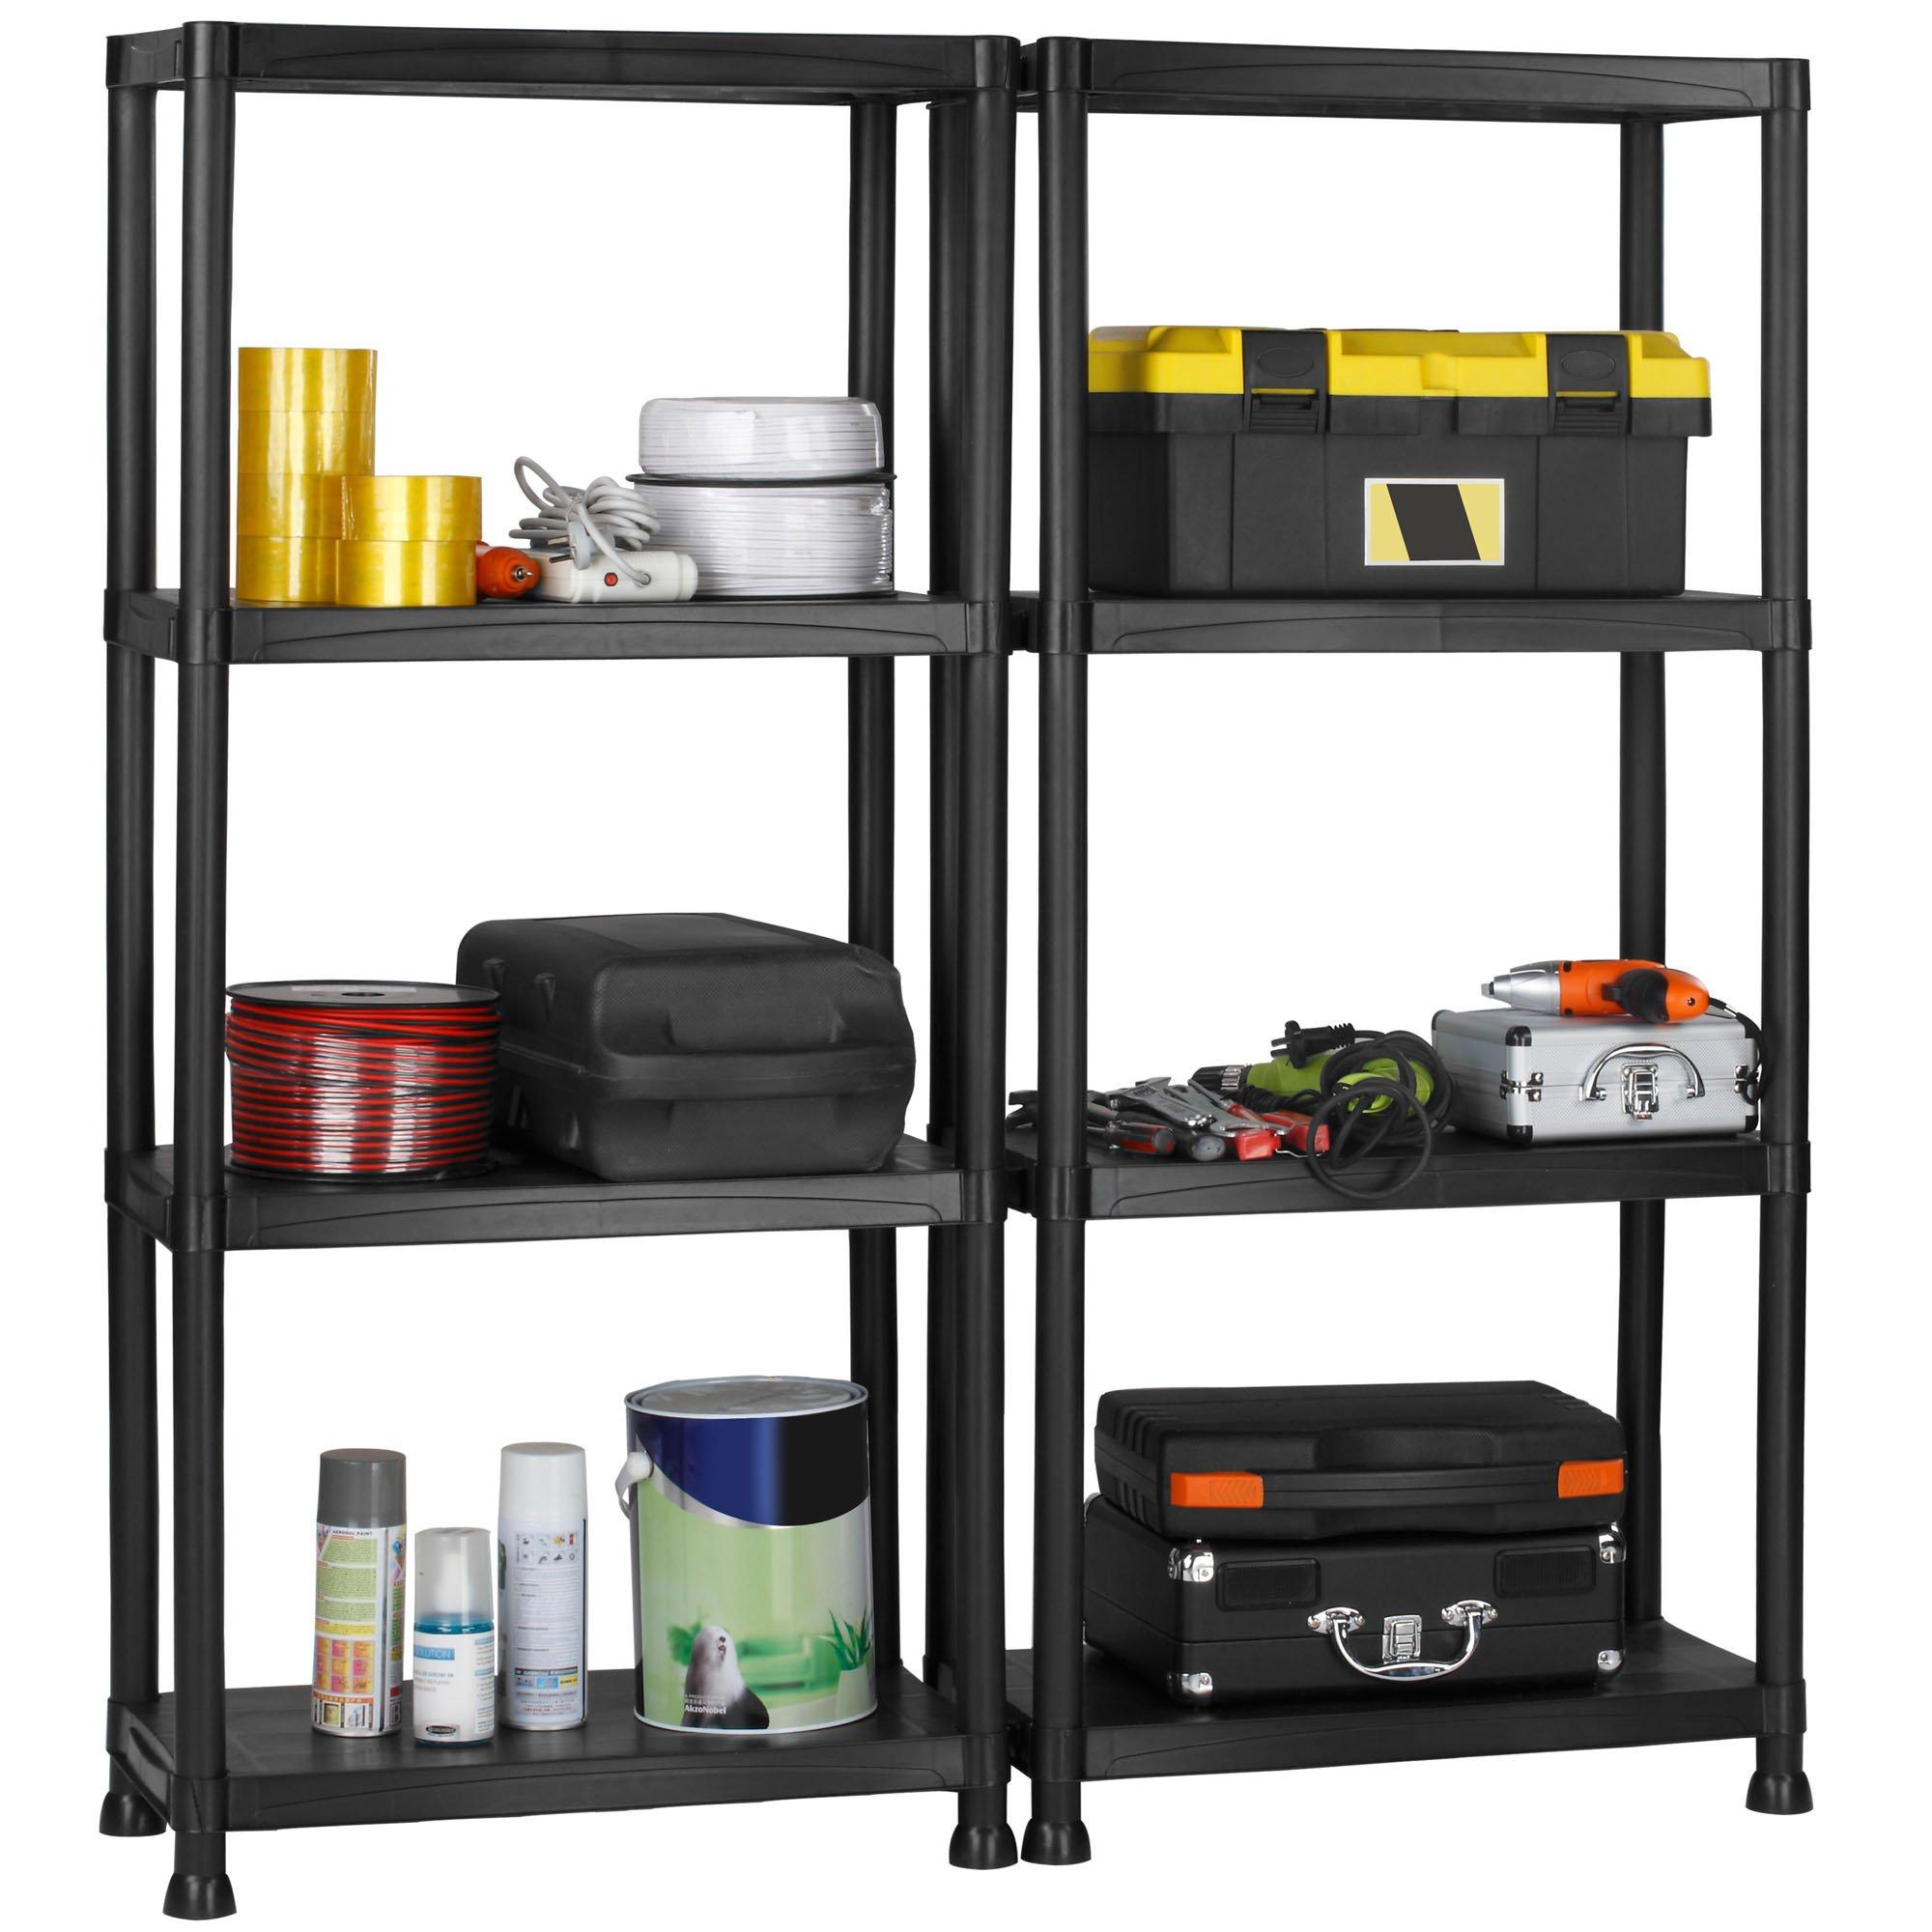 VonHaus 4 Tier Garage Shelving Unit with Wall Brackets (Pack of 2) - Black Plastic Interlocking Utility Storage Shelves - Each Unit: 52 x 24 x 12 inches